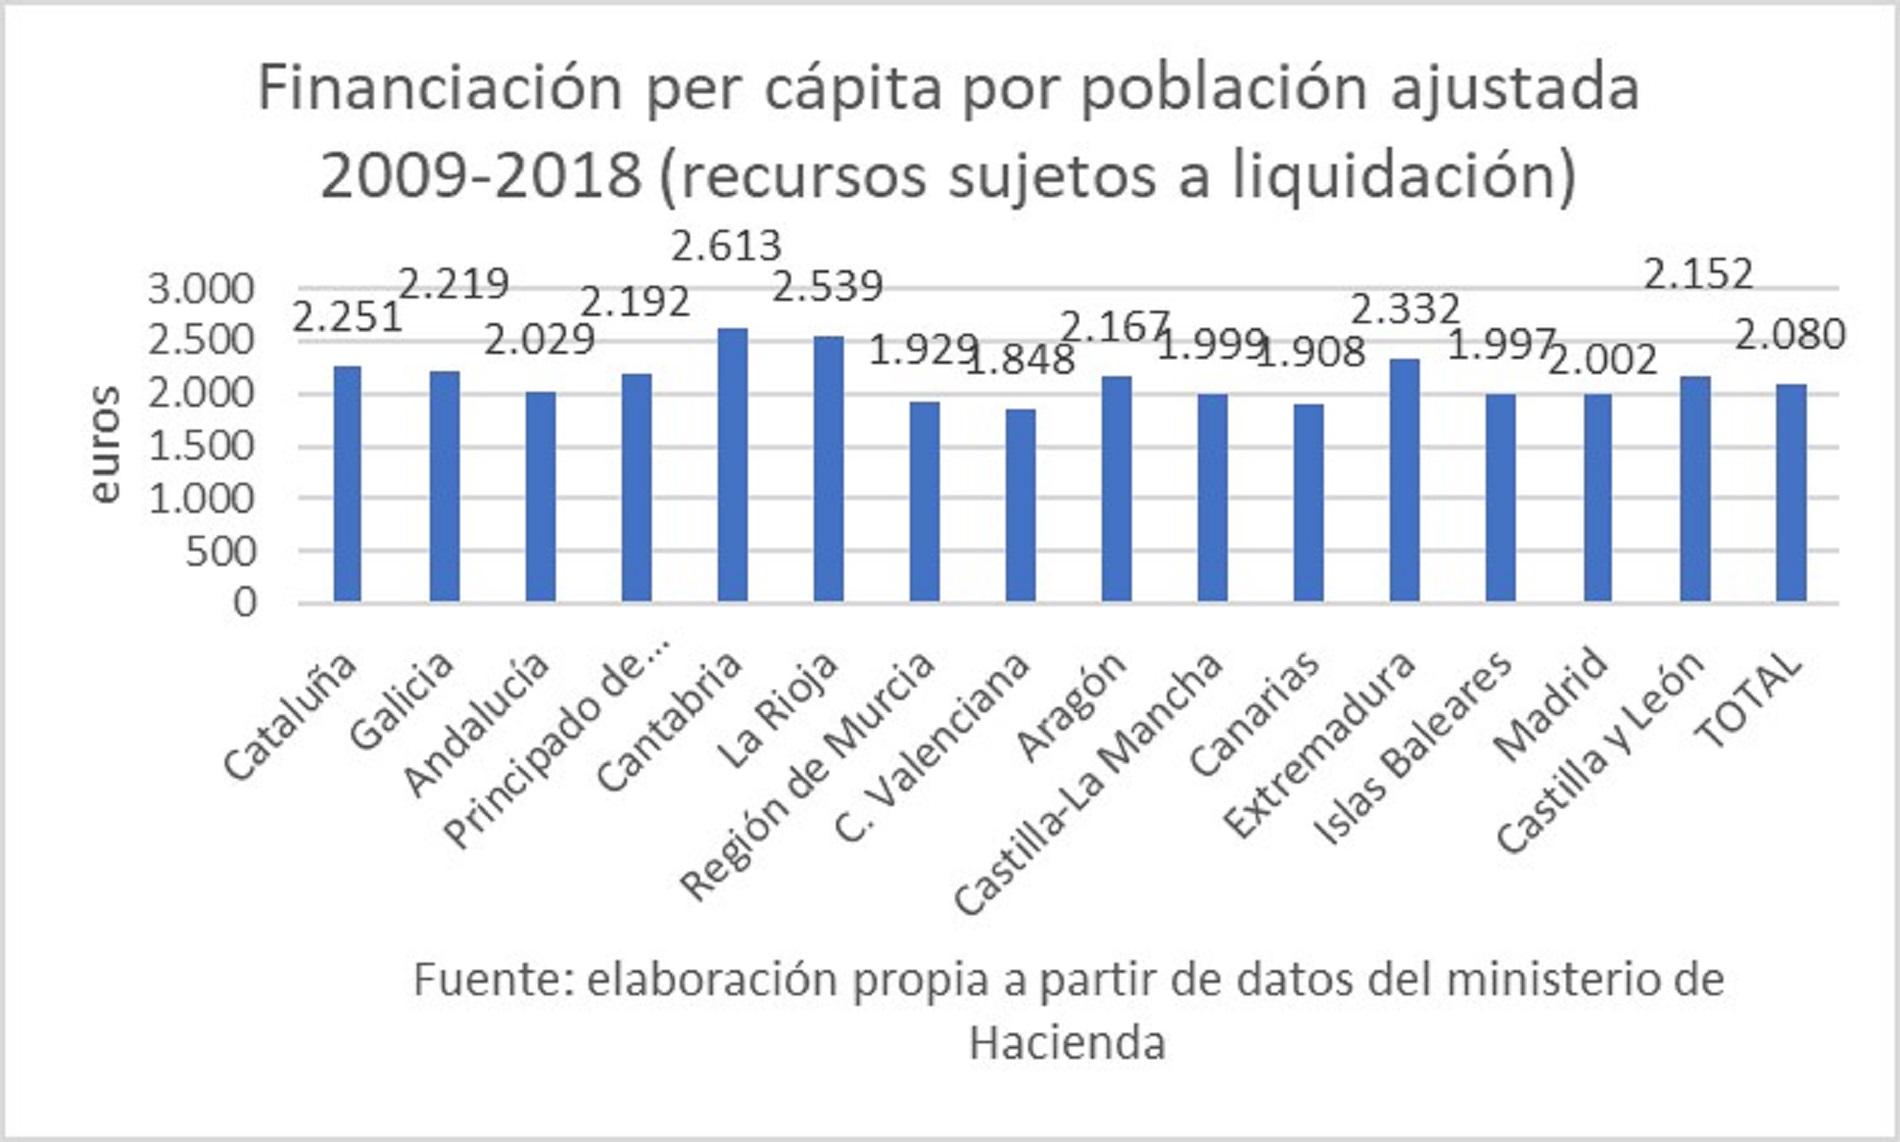 financiacion-per-capita-ajustada-sfa-2009-2018.jpg